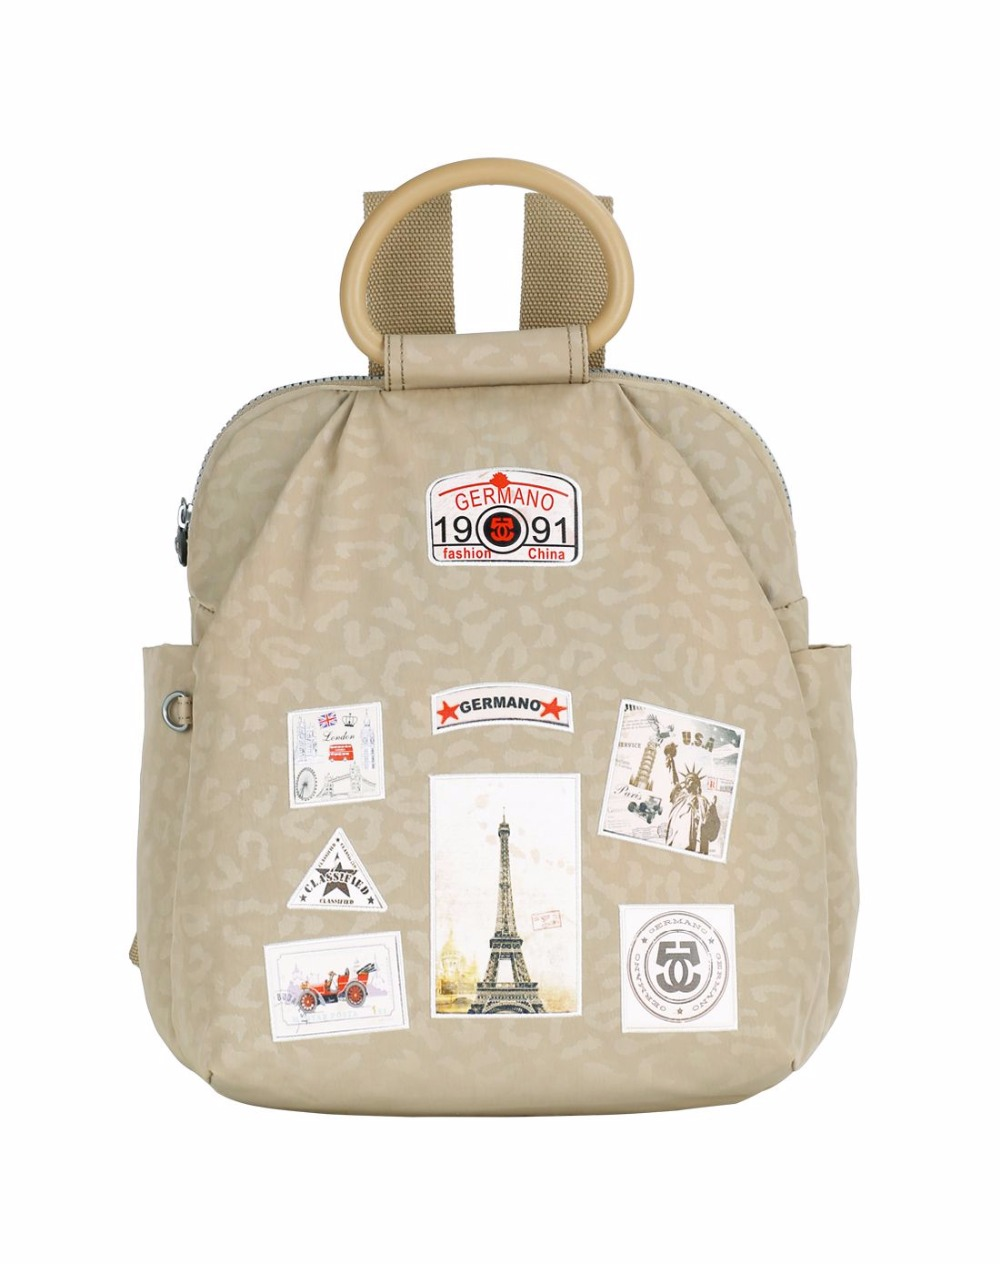 ФОТО Germano Kip Backpack Mochila Escolar Shoulder SchoolBag Waterproof Nylon Women Backpack Fashion ladd Backpack Casual Knapsack